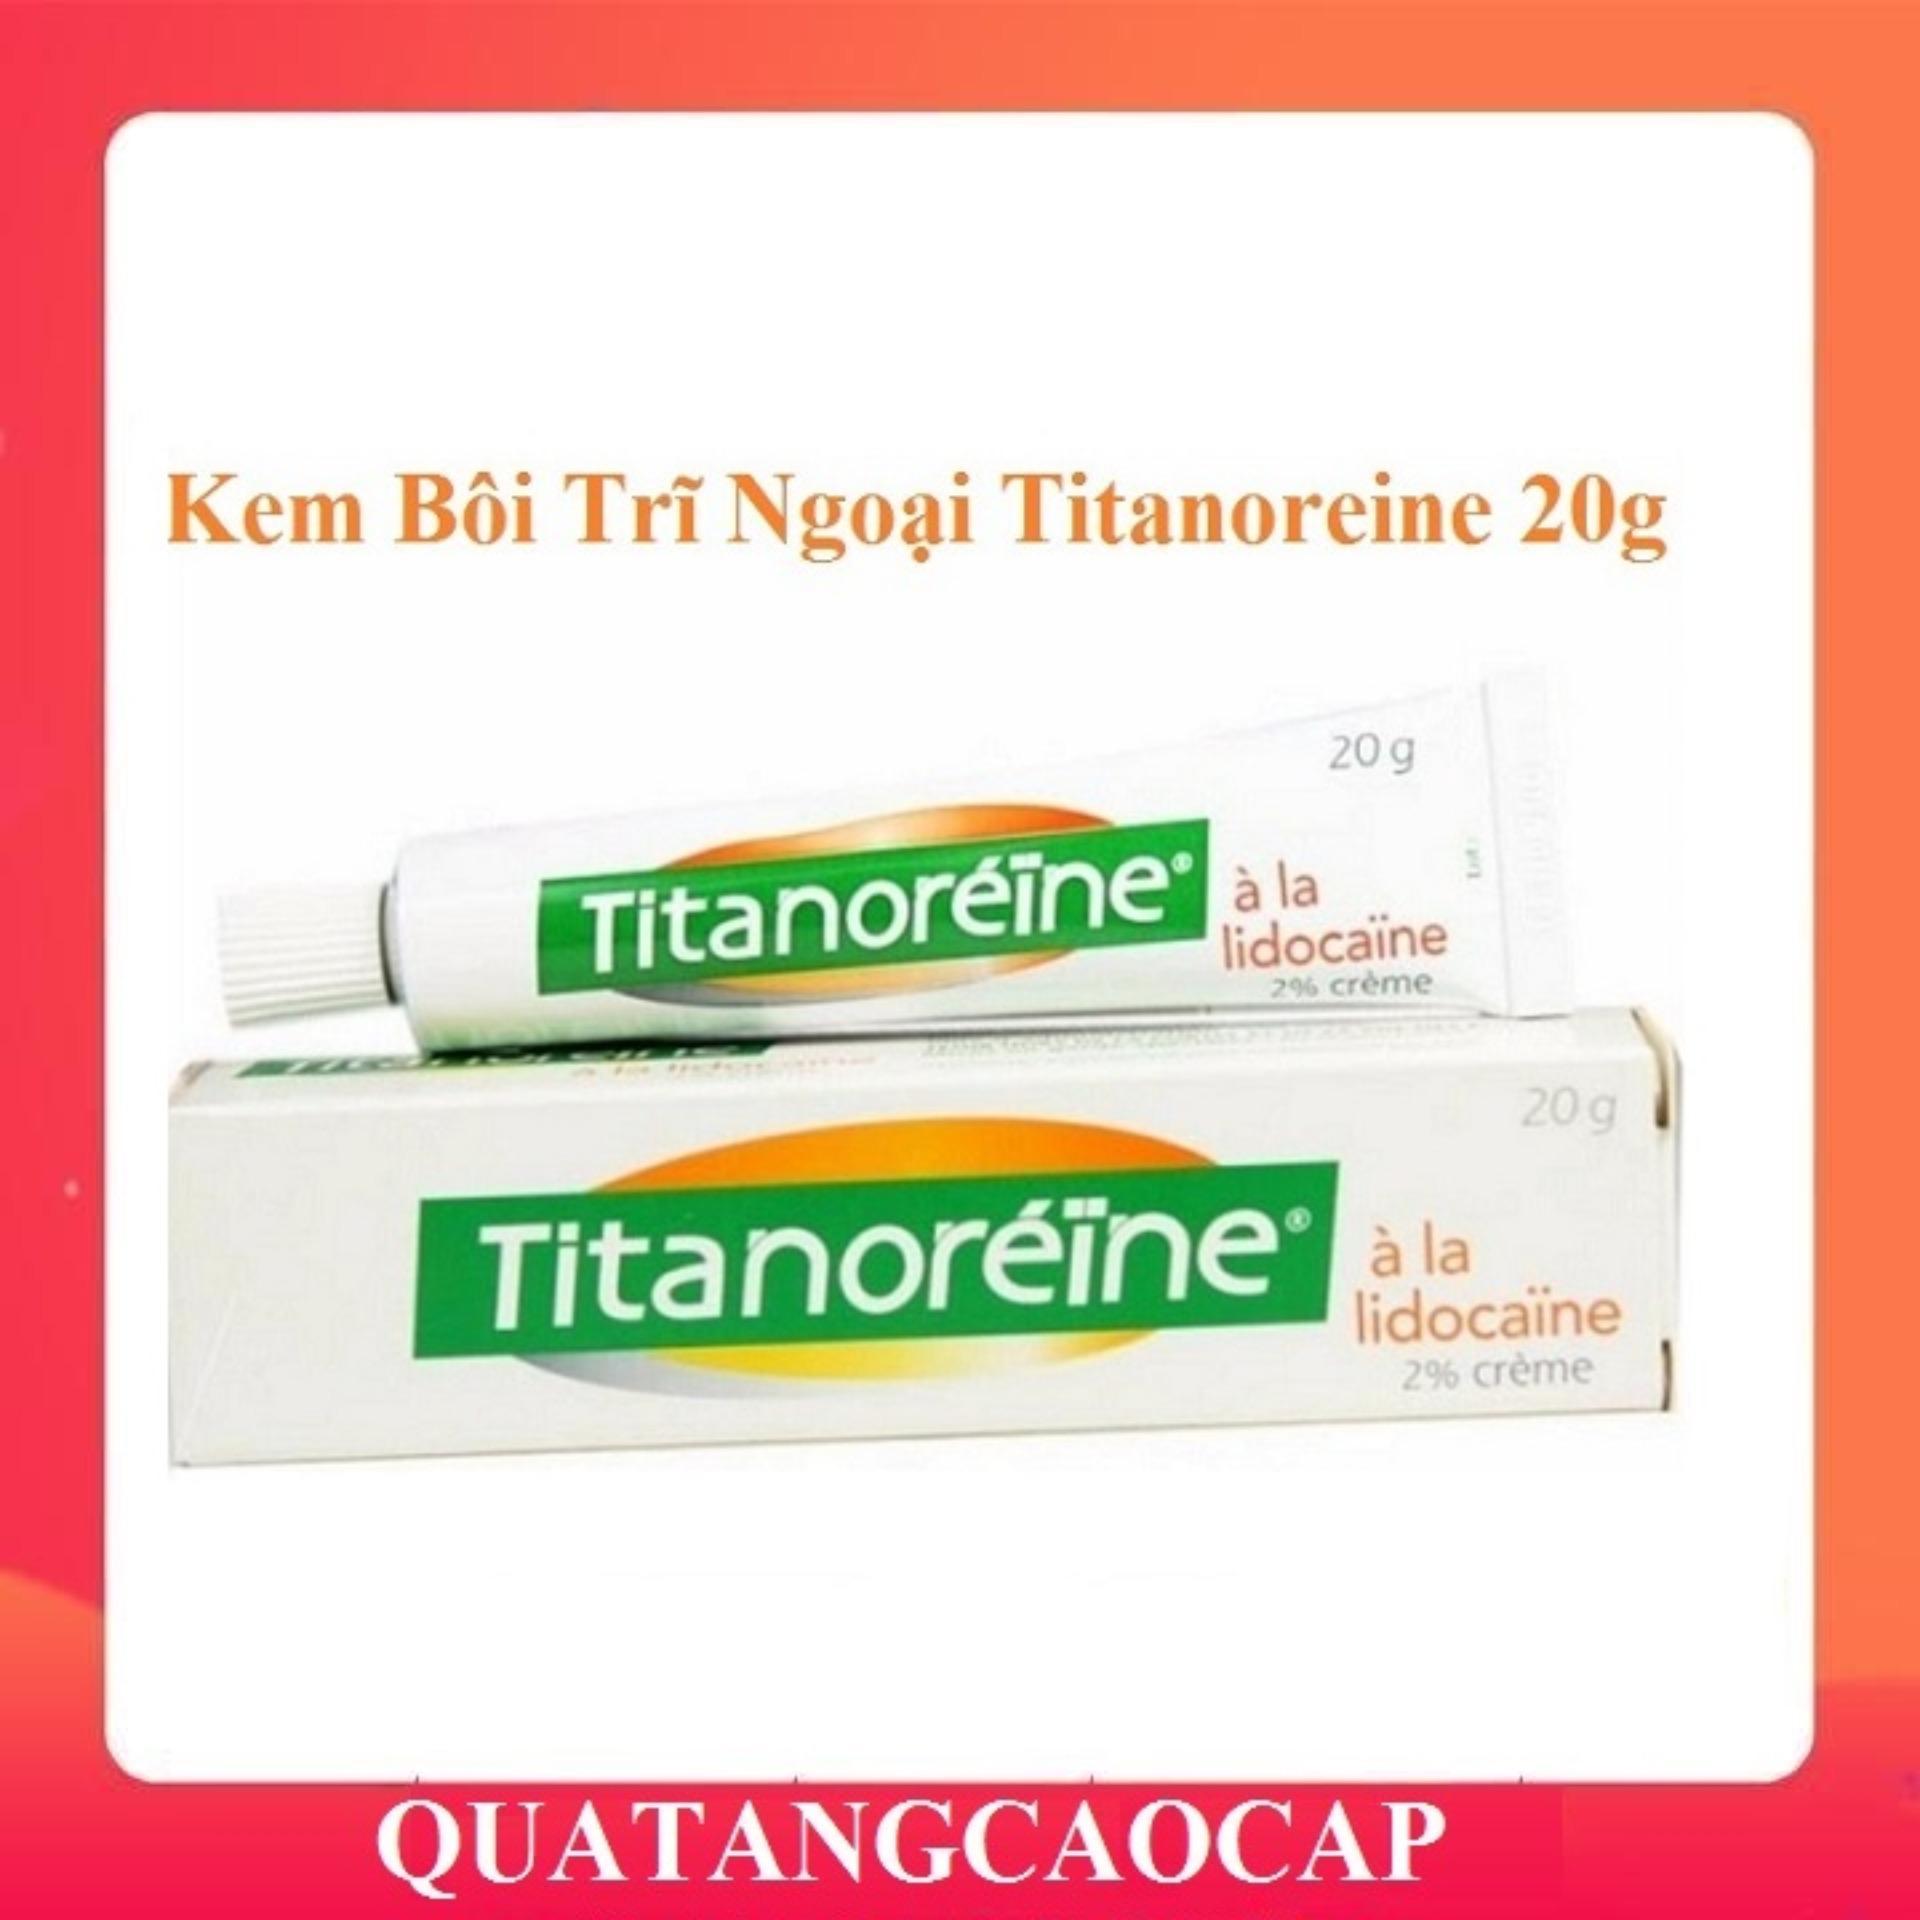 Kem bôi trĩ ngoại Titanoreine của Pháp (20gr)